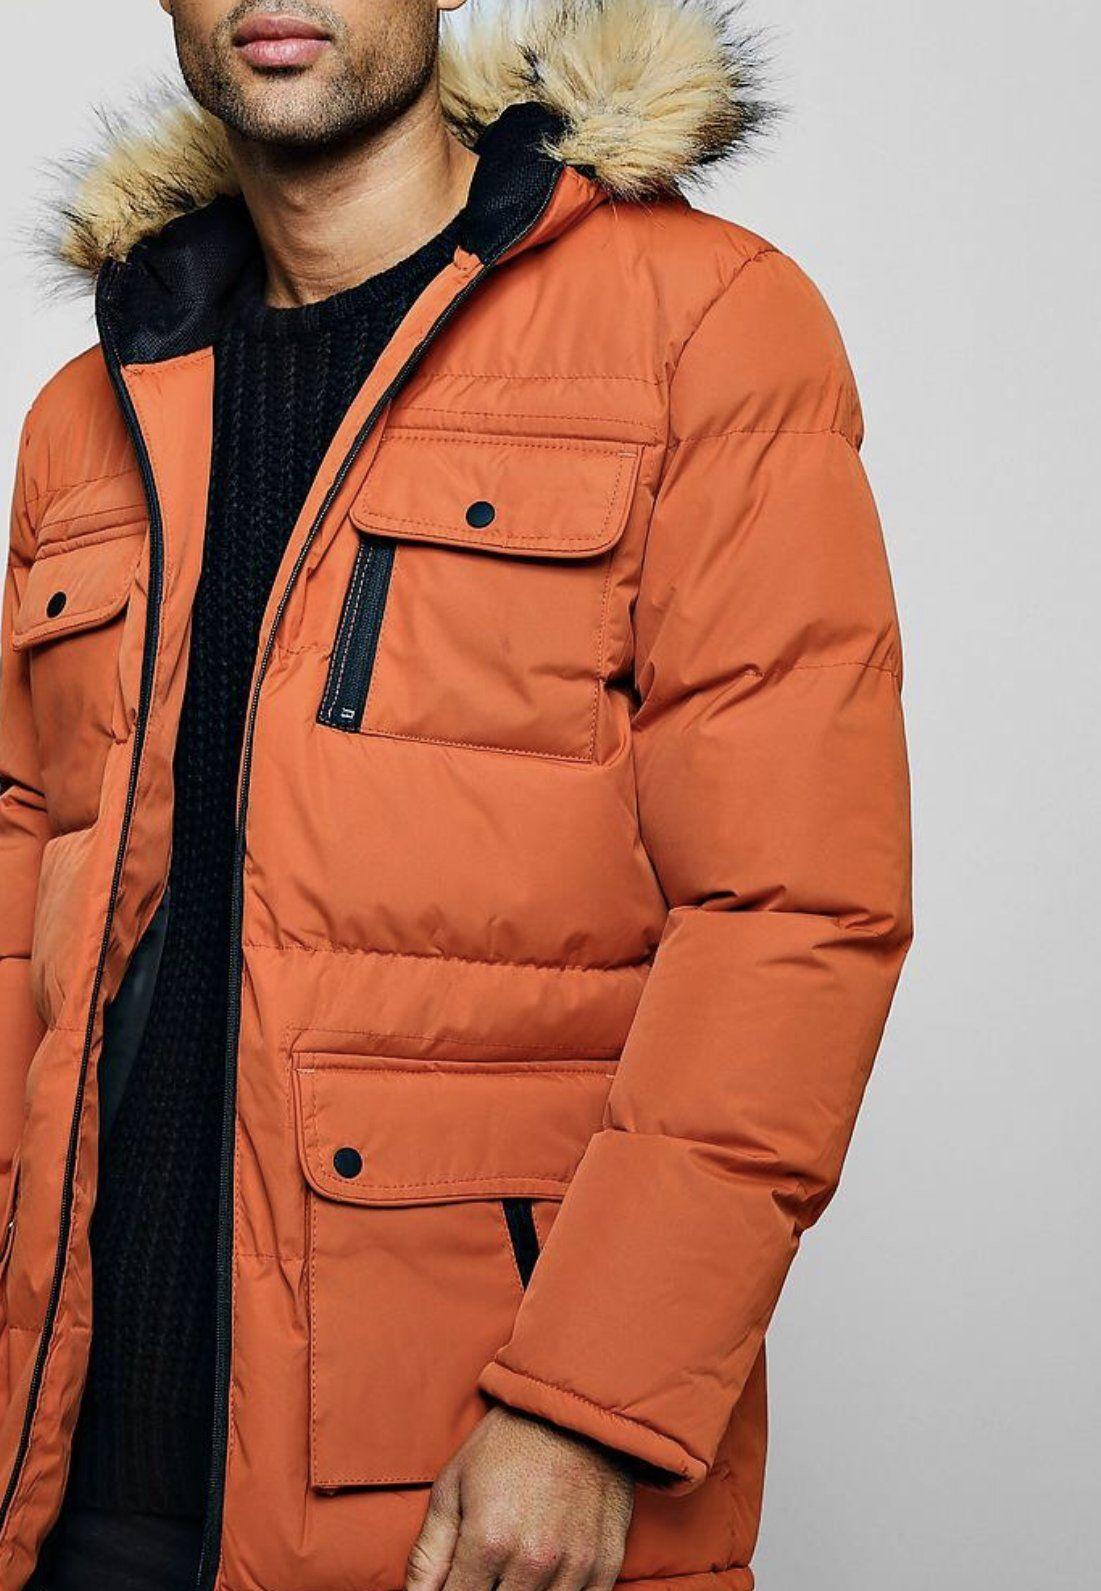 Men S Orange Outerwear With Multiple Pockets Mens Winter Fashion Mens Jackets Winter Jackets [ 1591 x 1101 Pixel ]